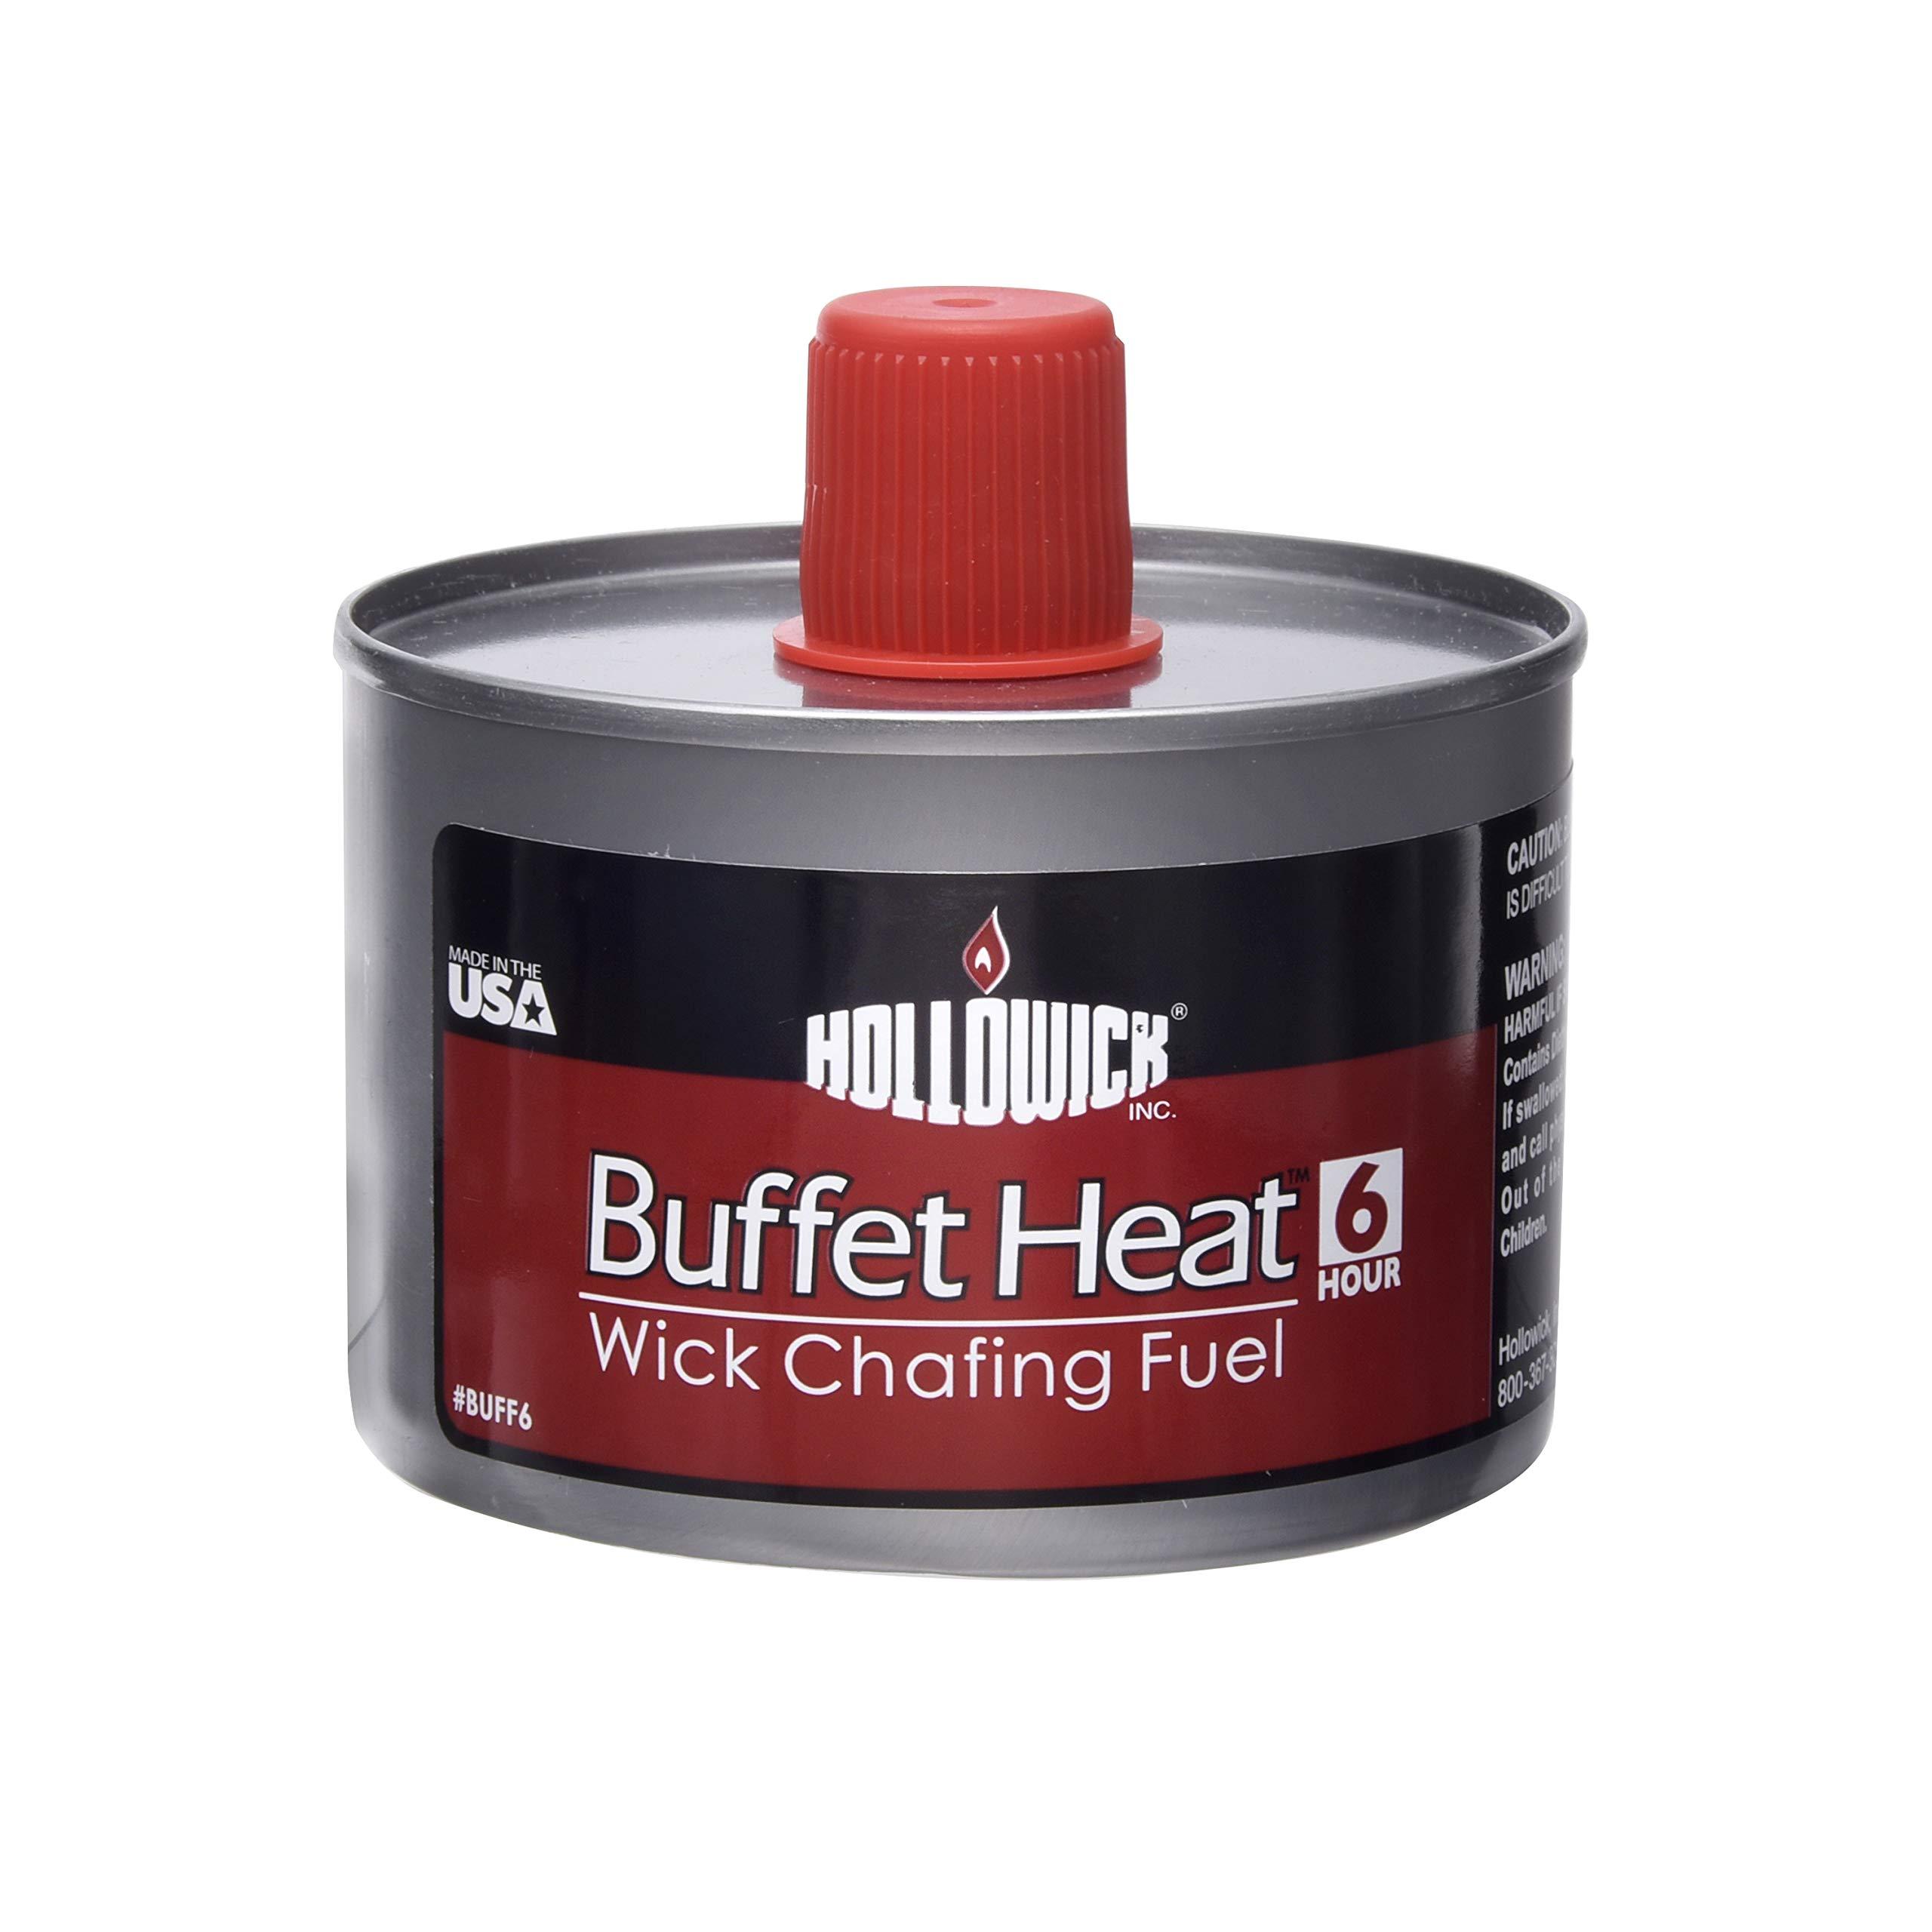 Hollowick BuffetHeat 6 Hour Liquid Wick Chafing Fuel (24/case)